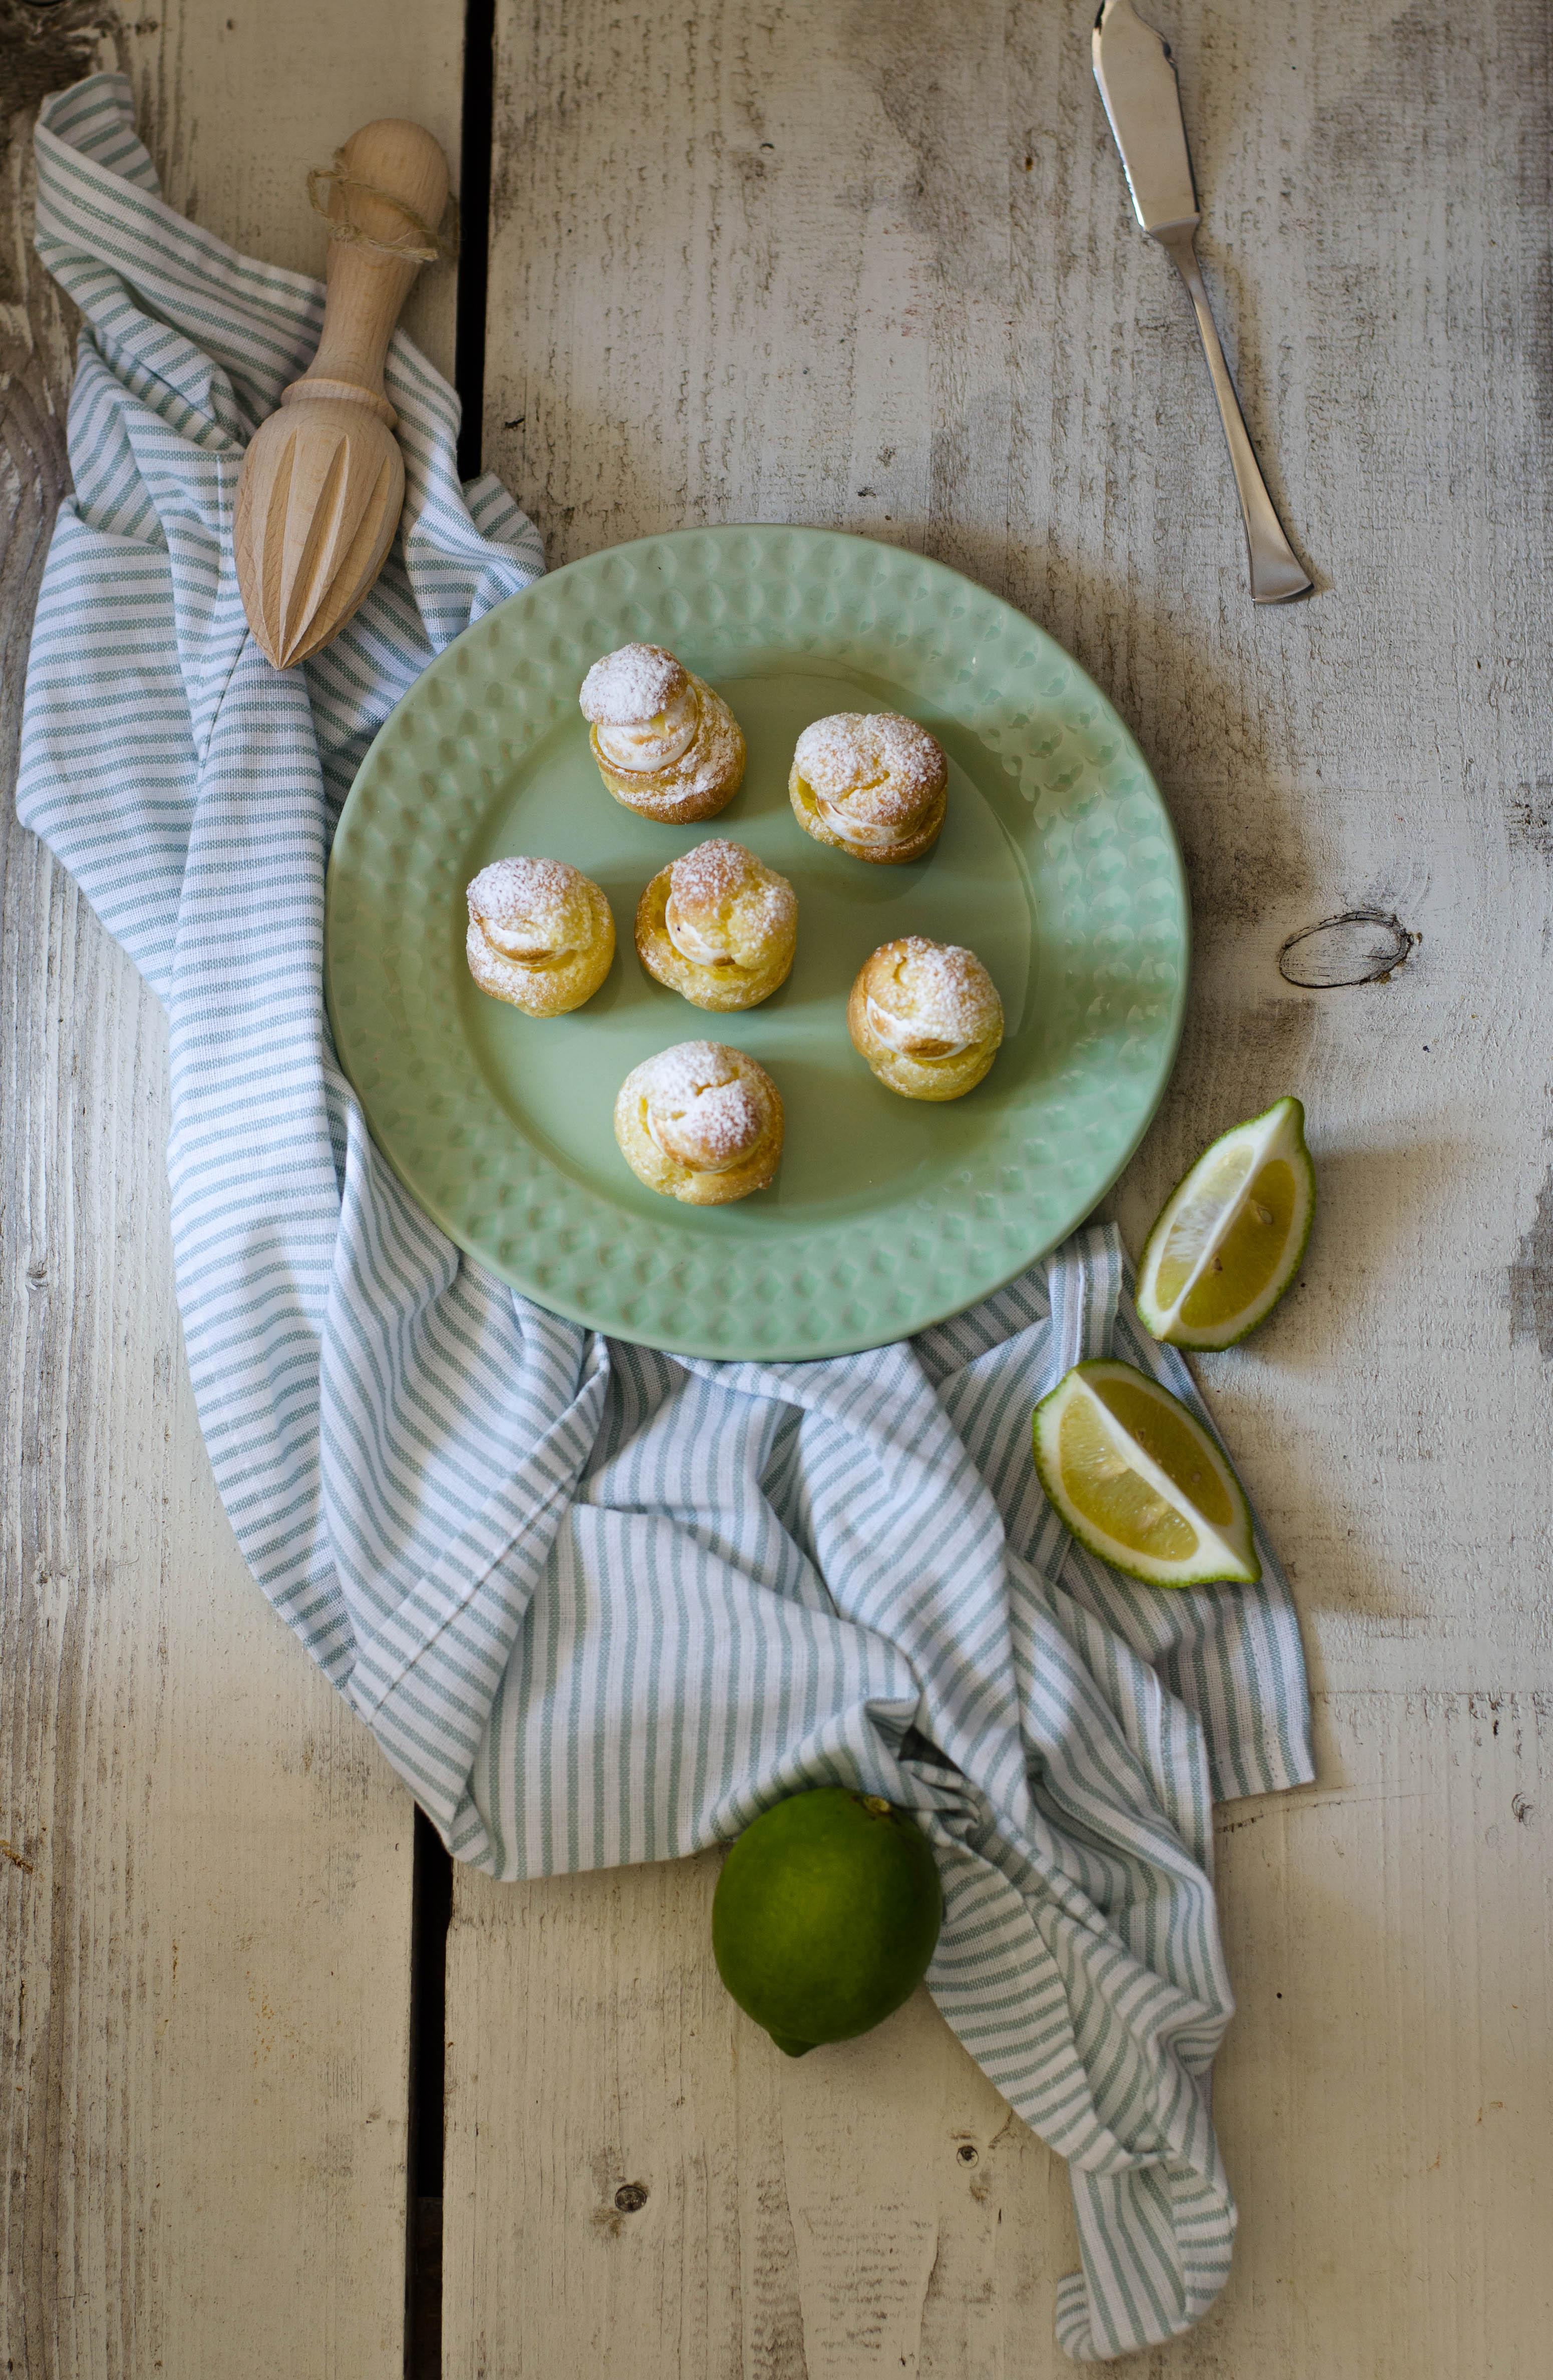 bigne_limone_meringa2-2 Bignè con crema al lime e meringa